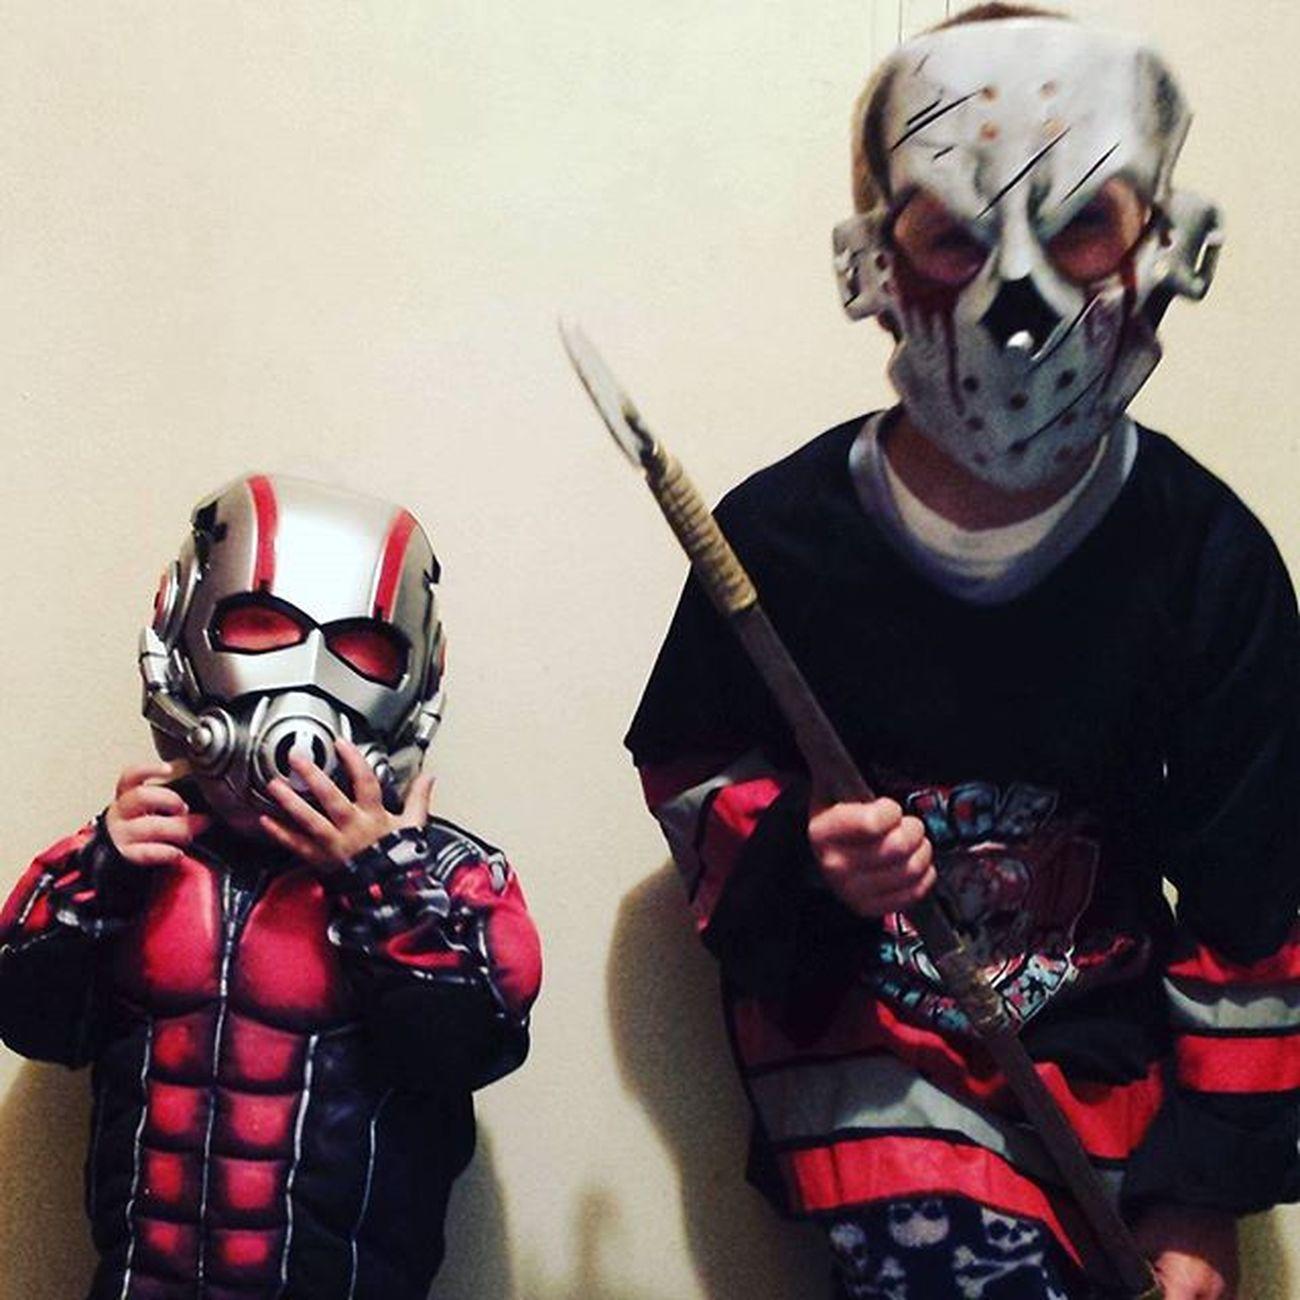 The spookiest boys I've ever seen😭 😈👻🎃🐜🔪Happyhalloween Booger Halloween2015 Antman